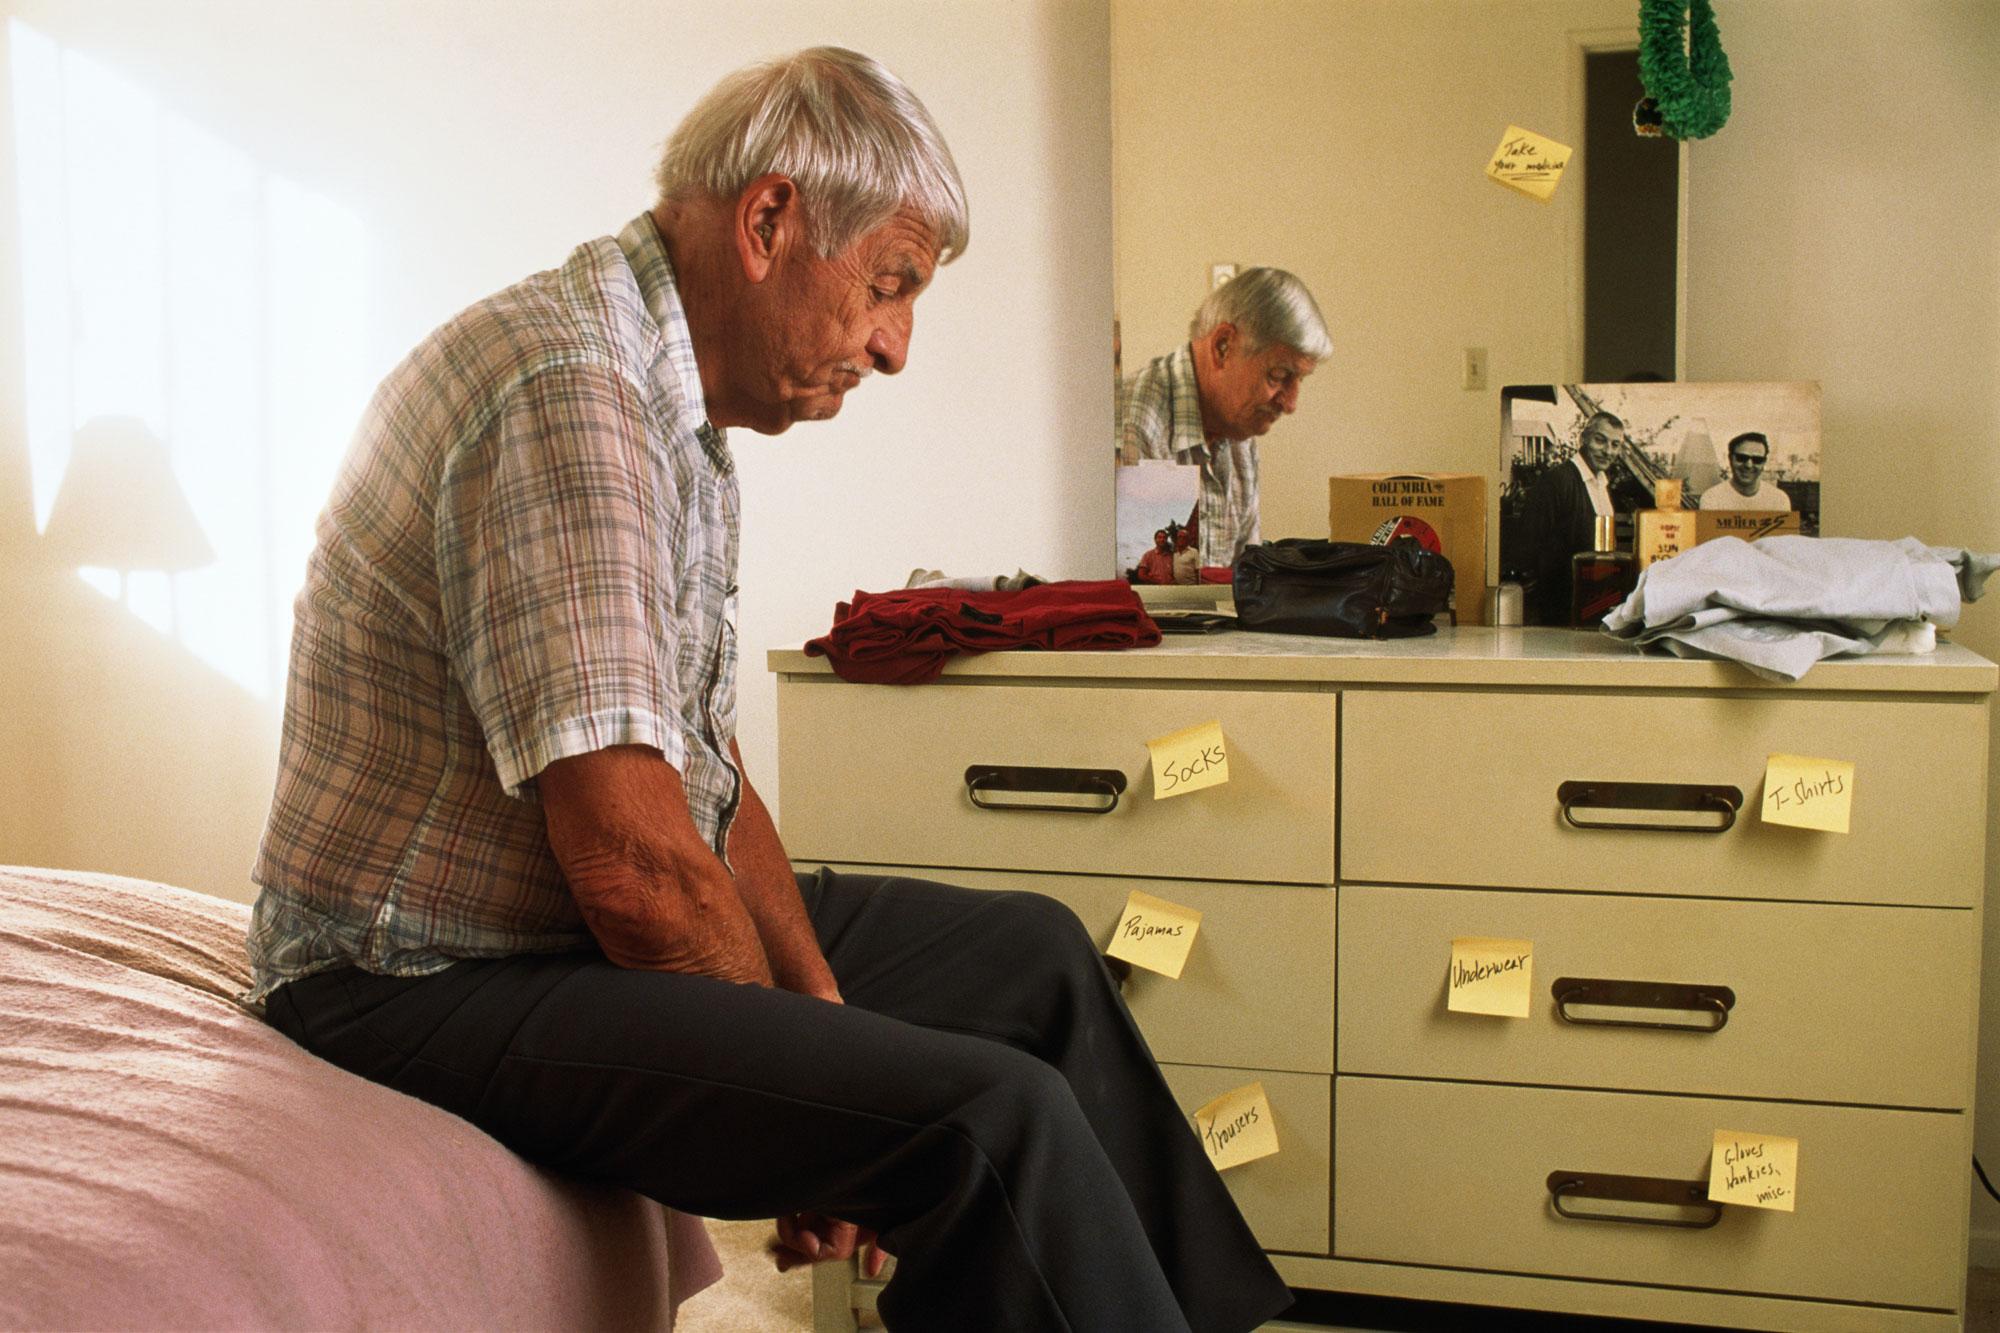 Sintomi Alzheimer: i primi campanelli d'allarme